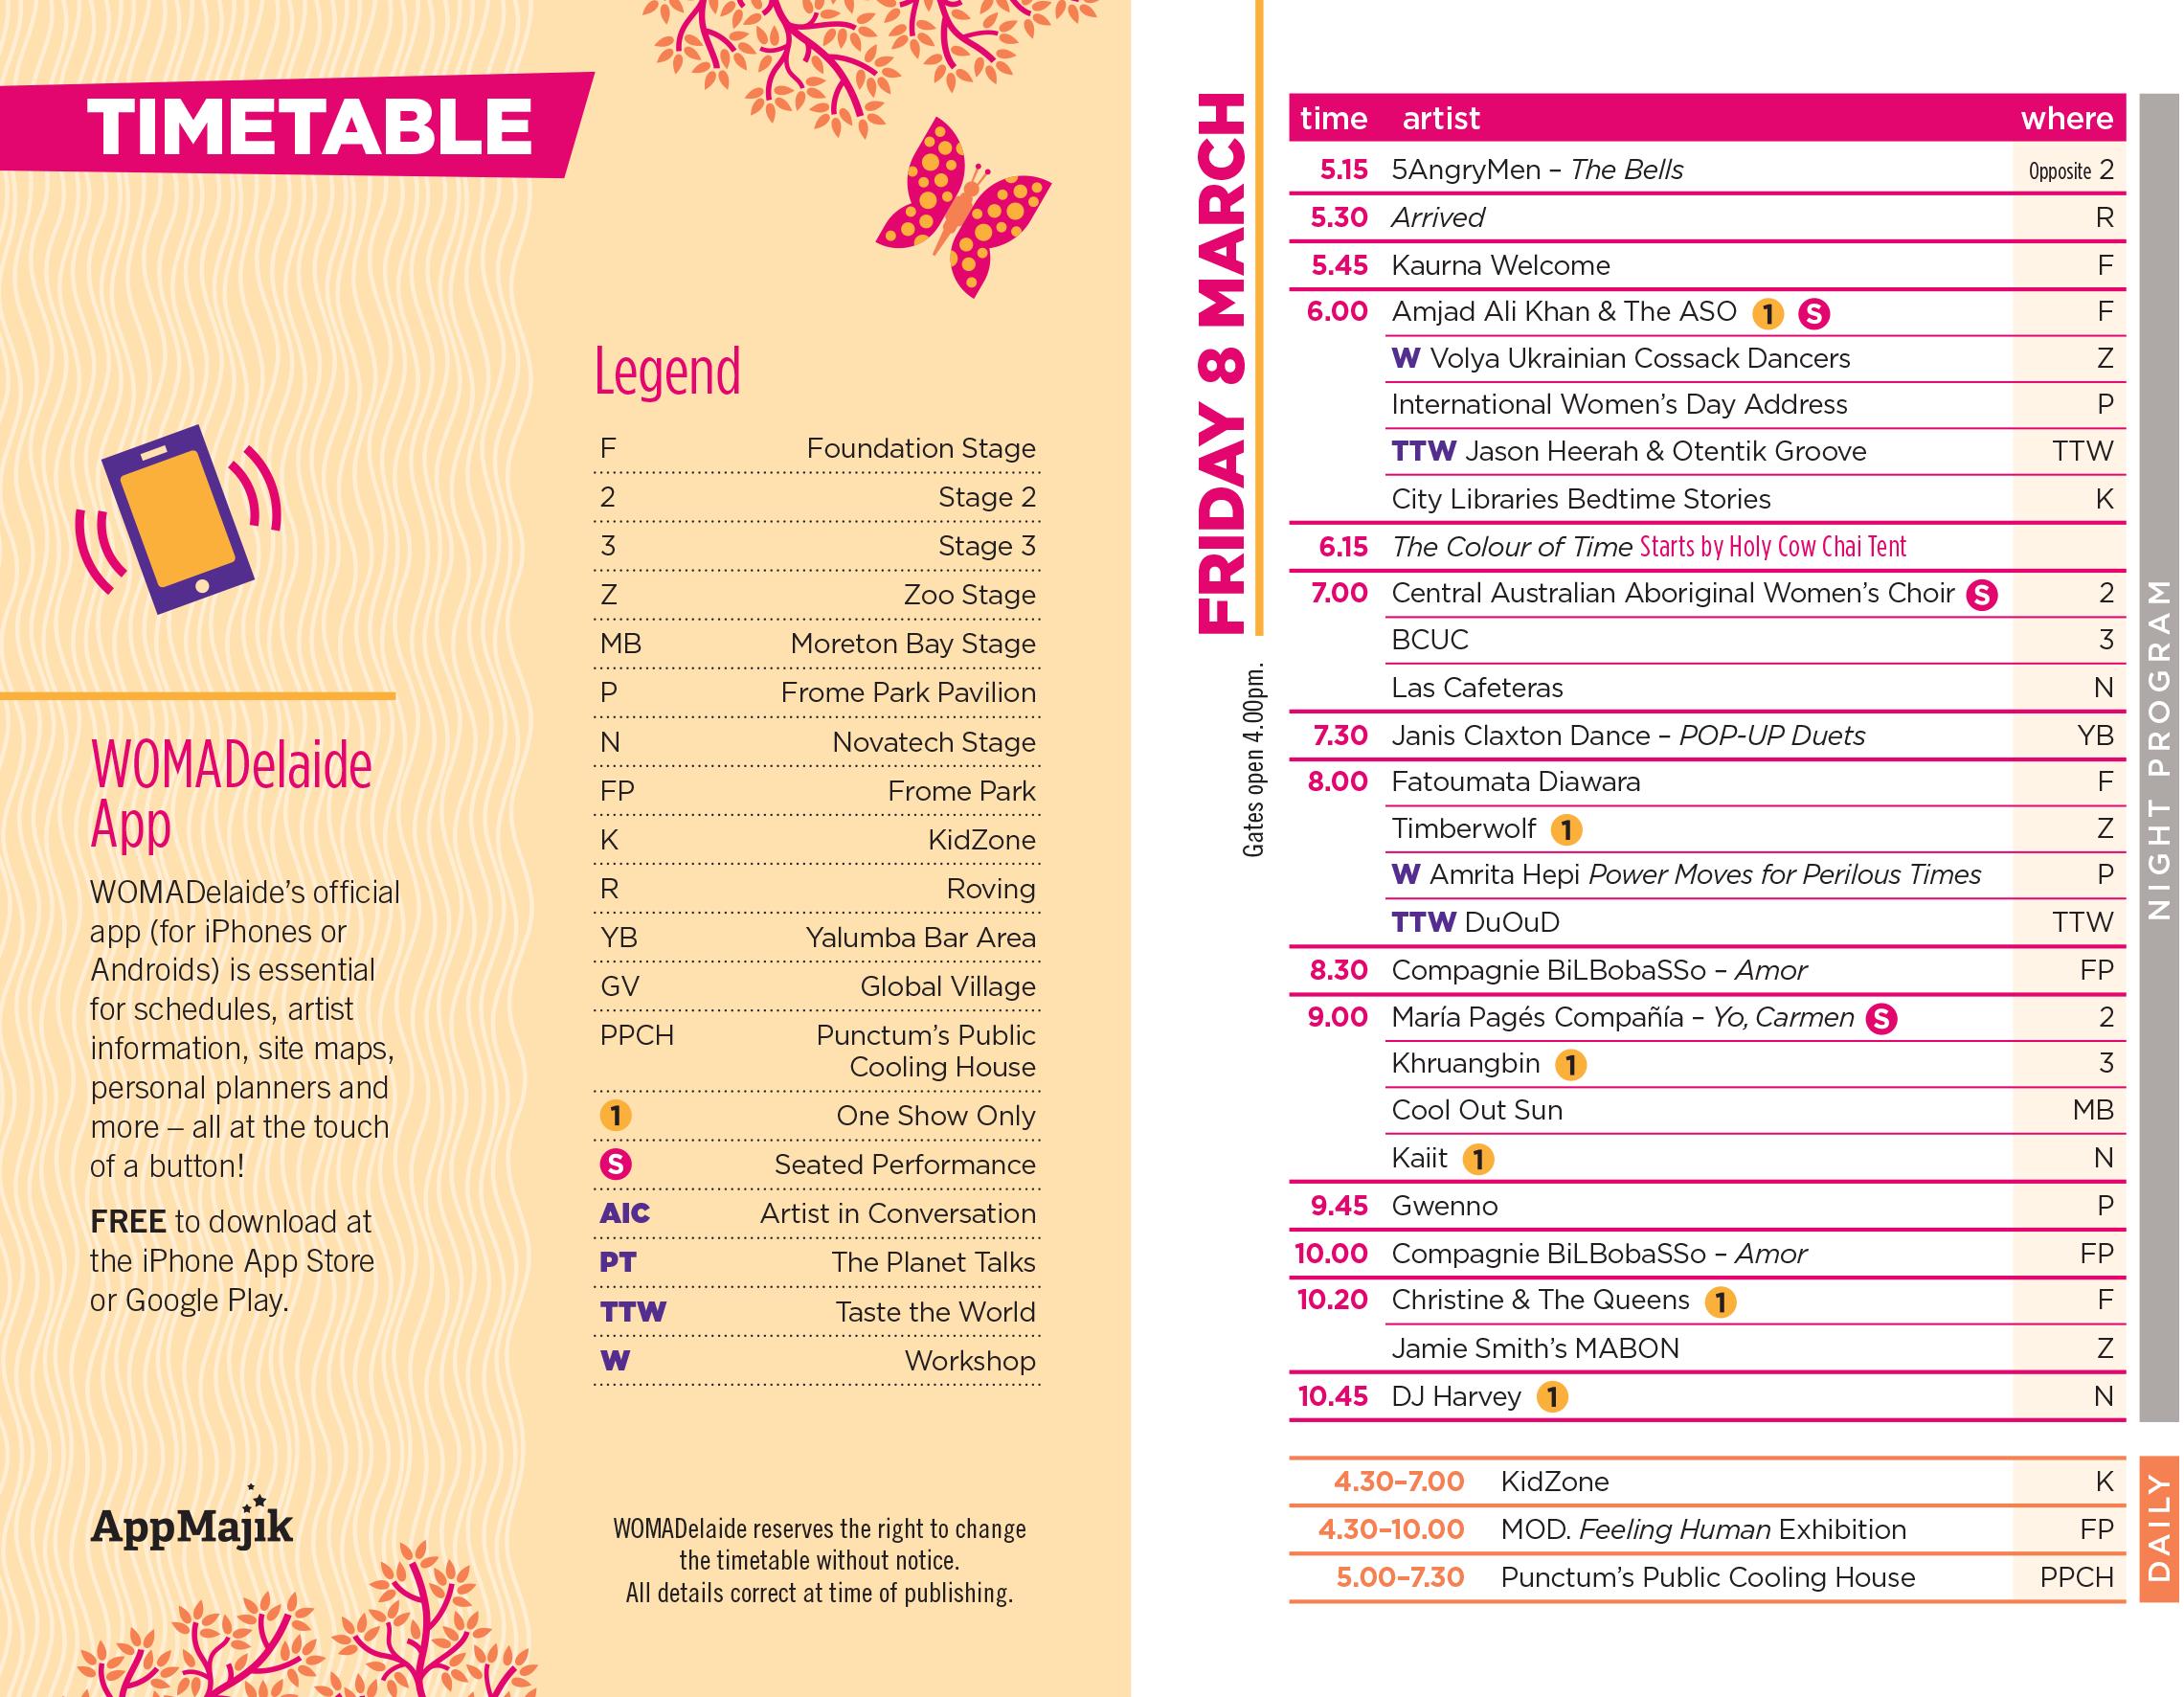 WOMADelaide_Timetable - 6 Feb 2019 FRI